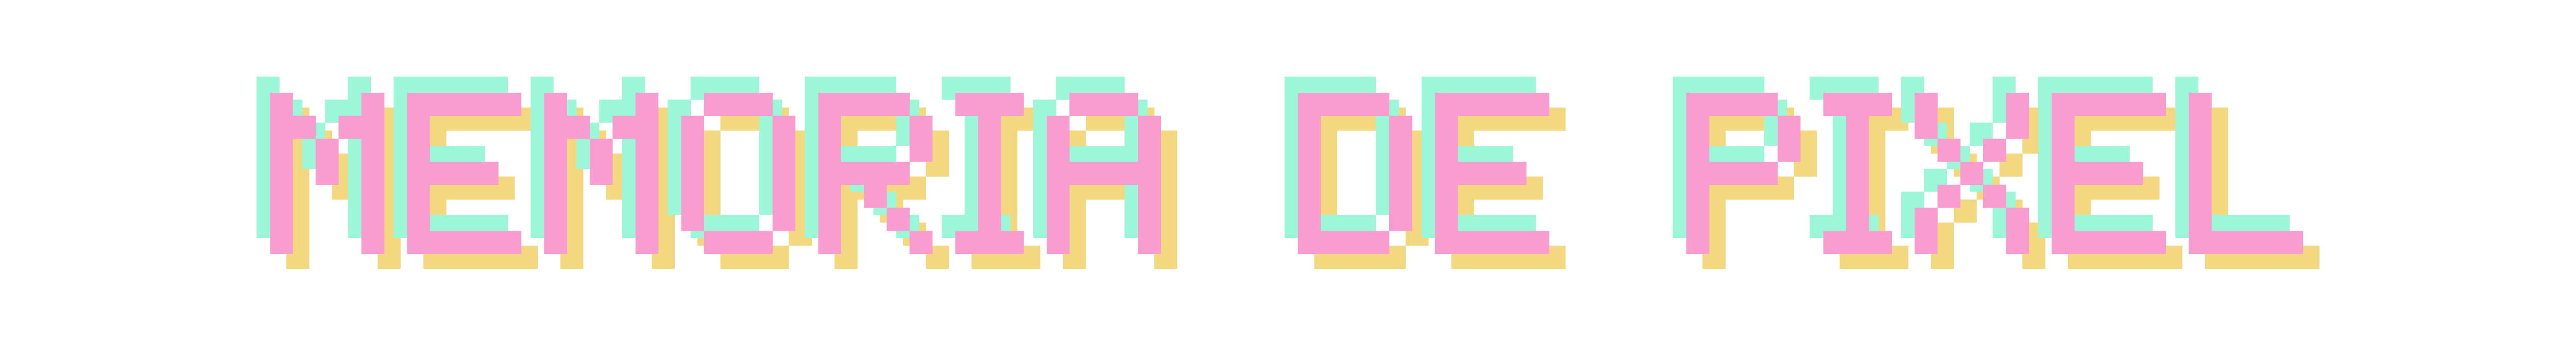 memoria de pixel